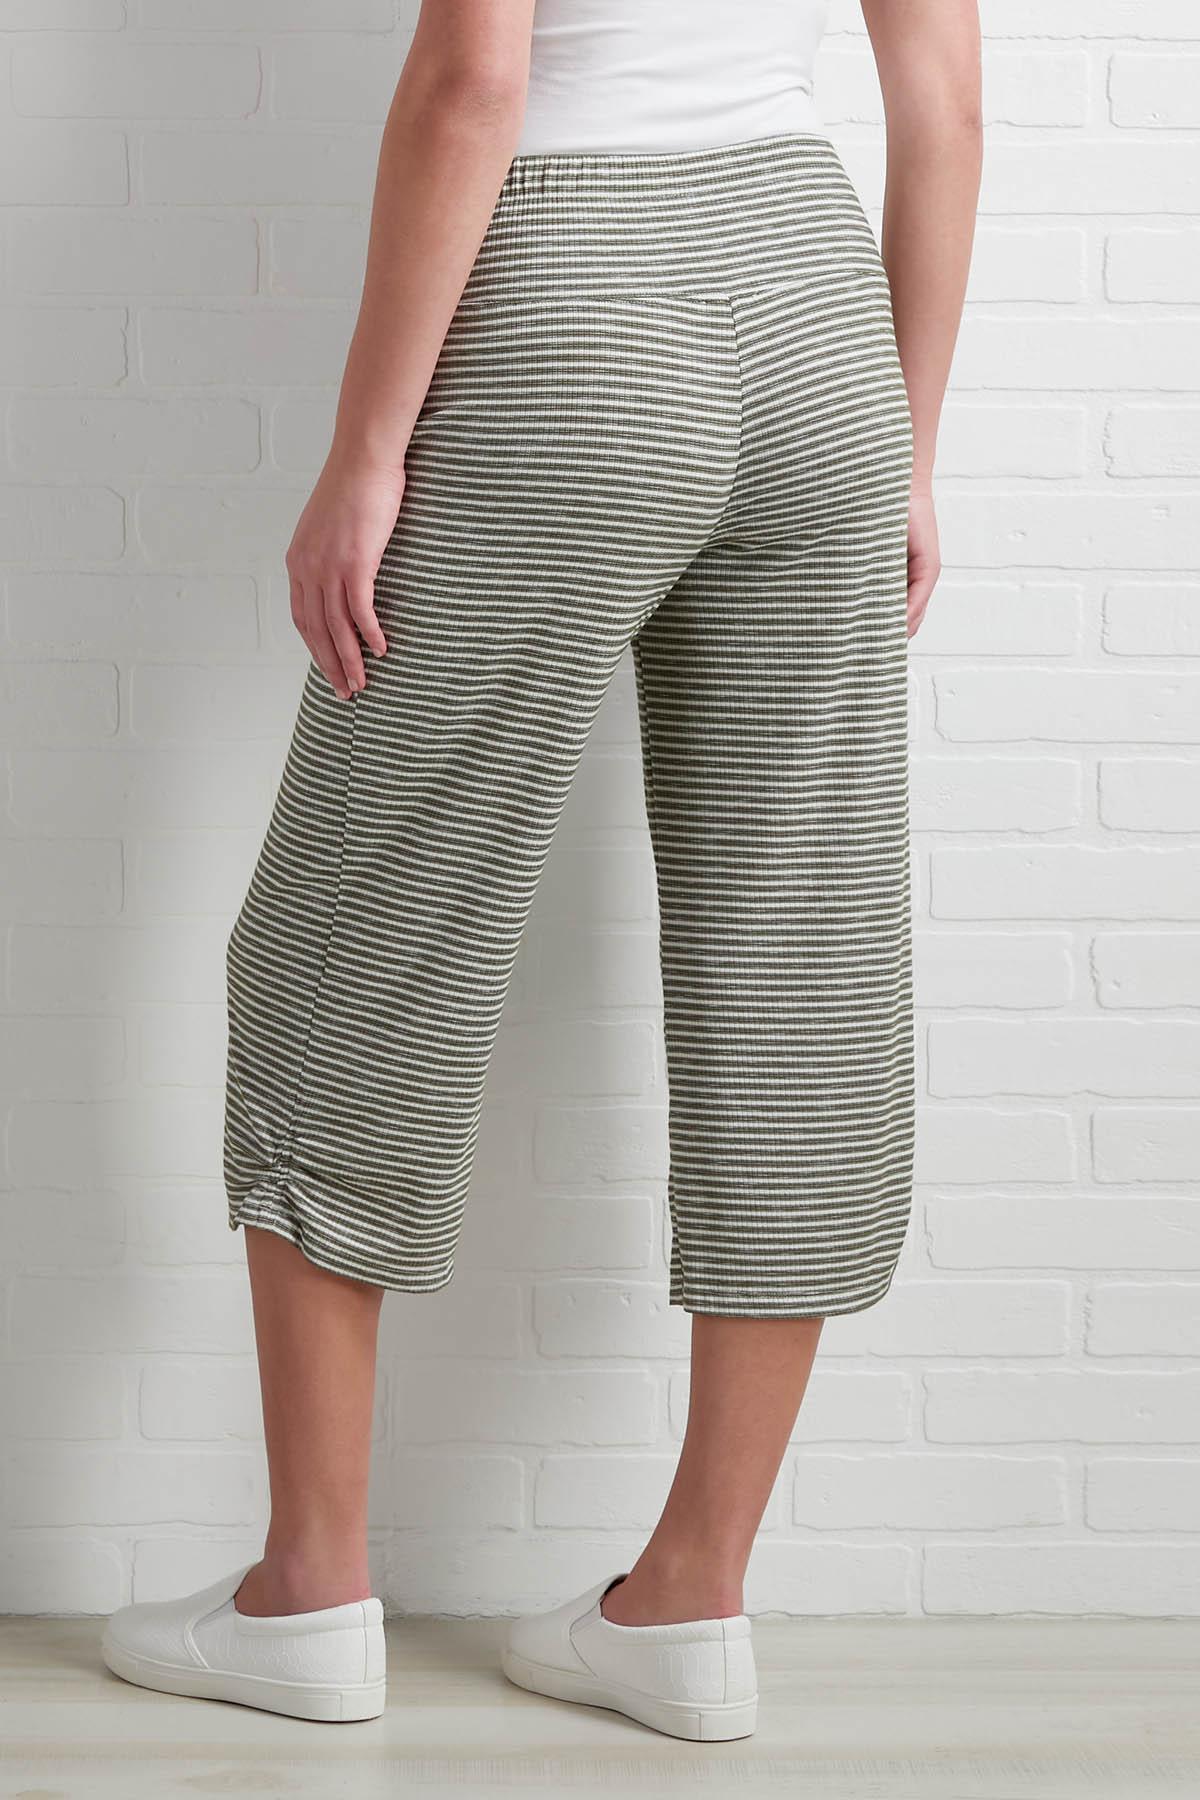 Olive The Sunshine Pants